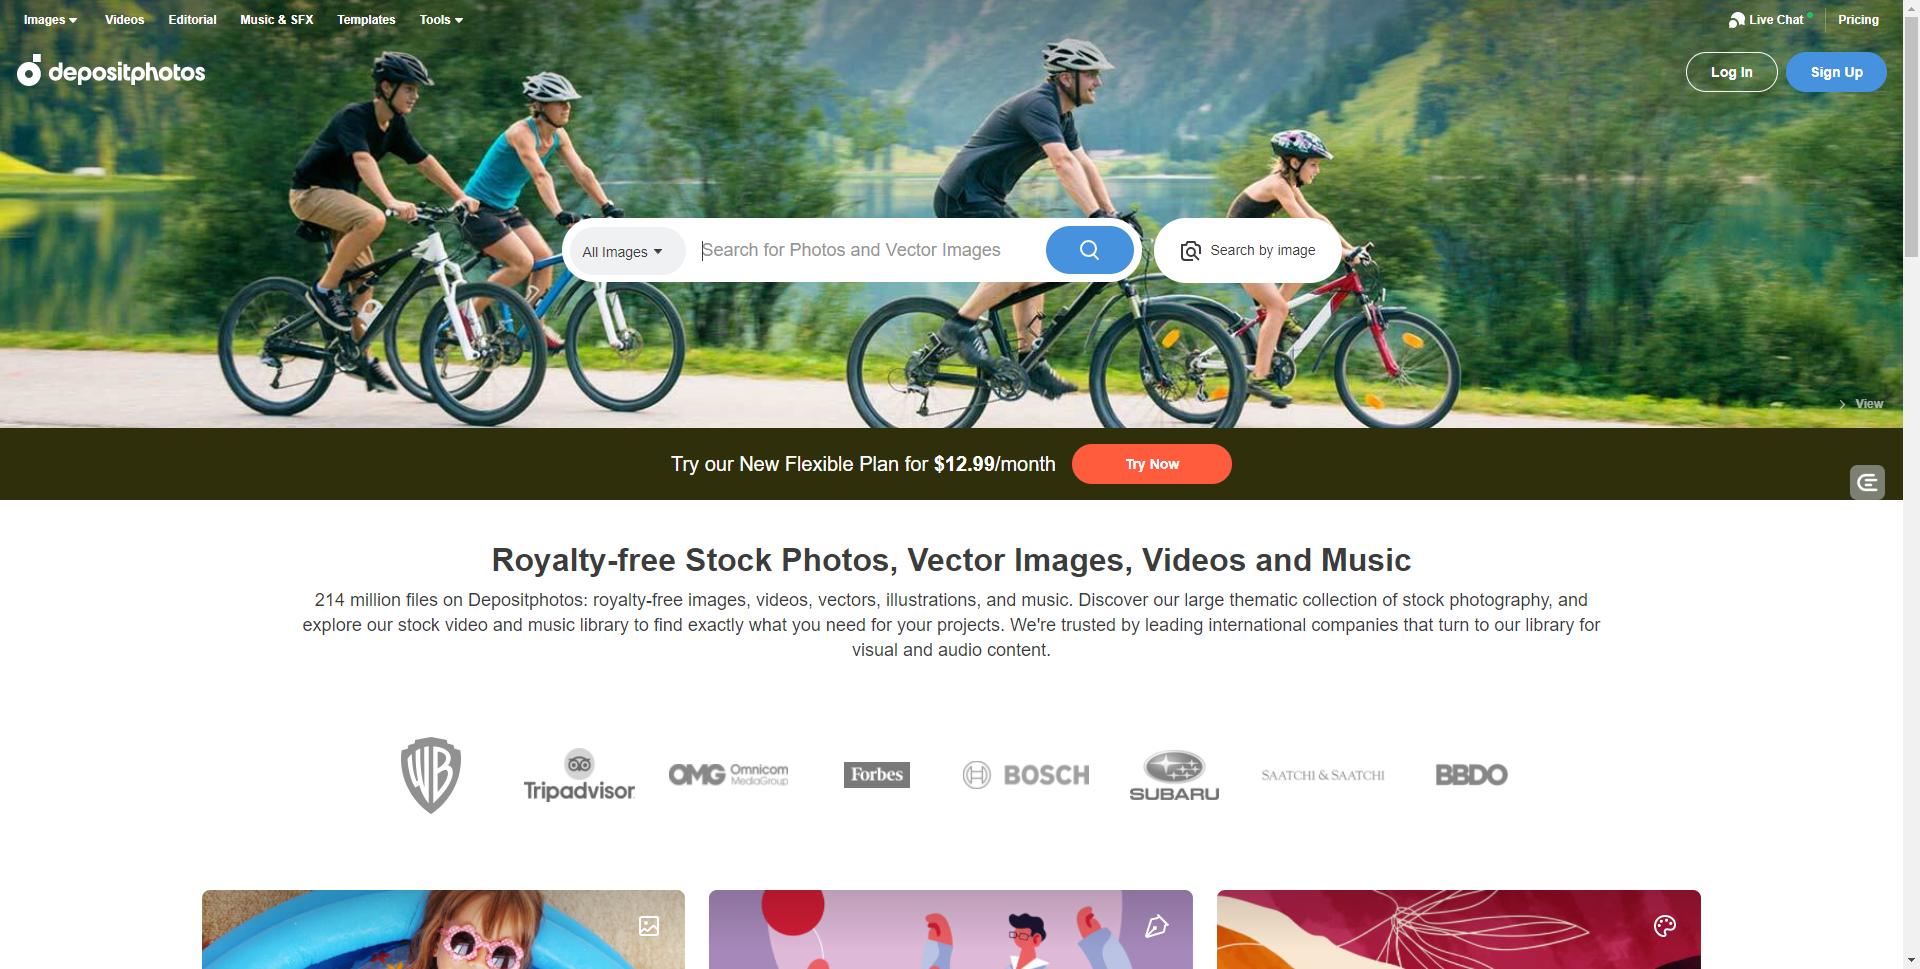 Depositphotos homepage